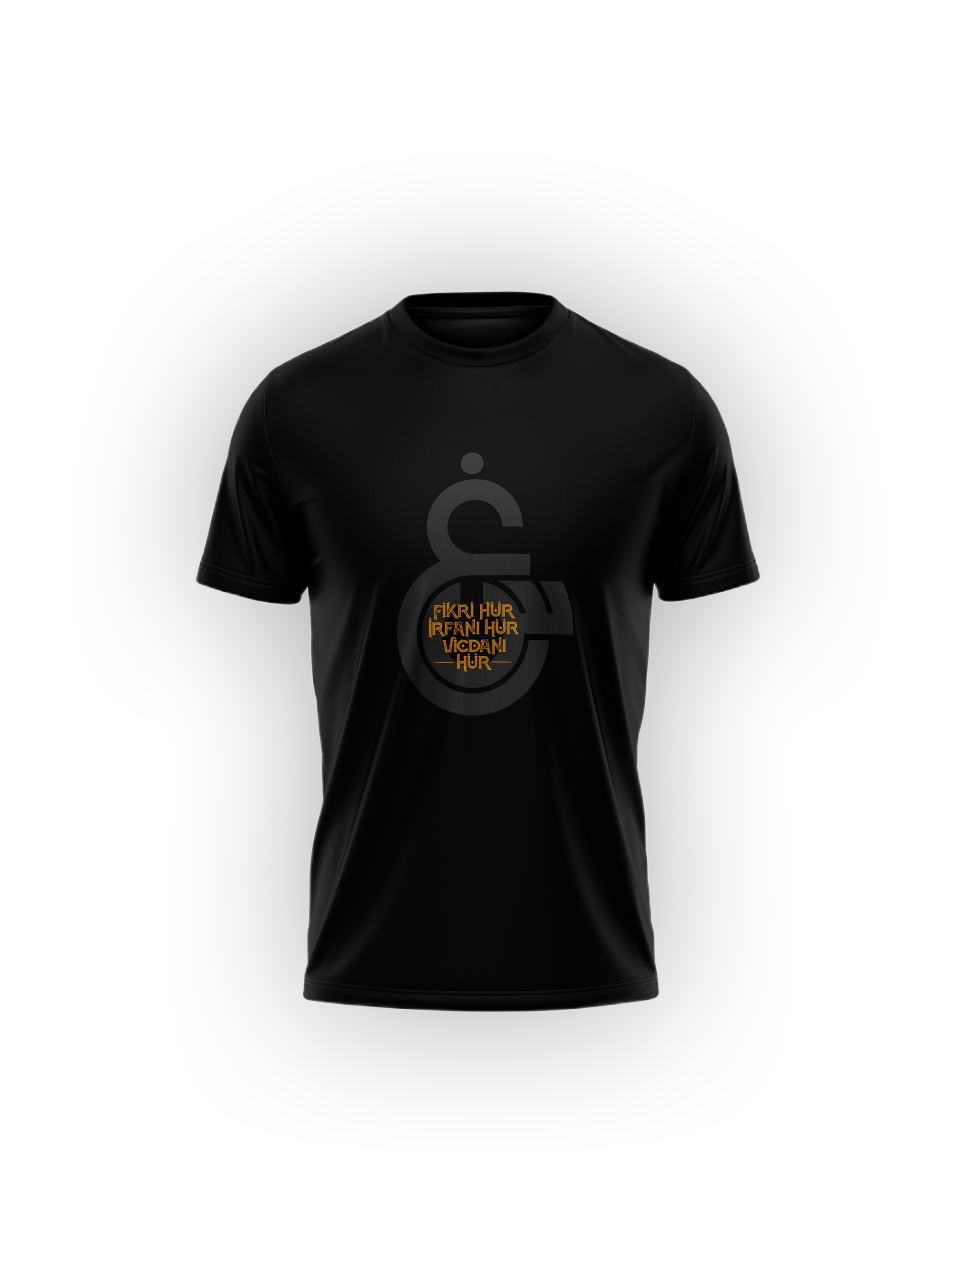 Galatasaray Fikri Hür Erkek T-shirt E211706